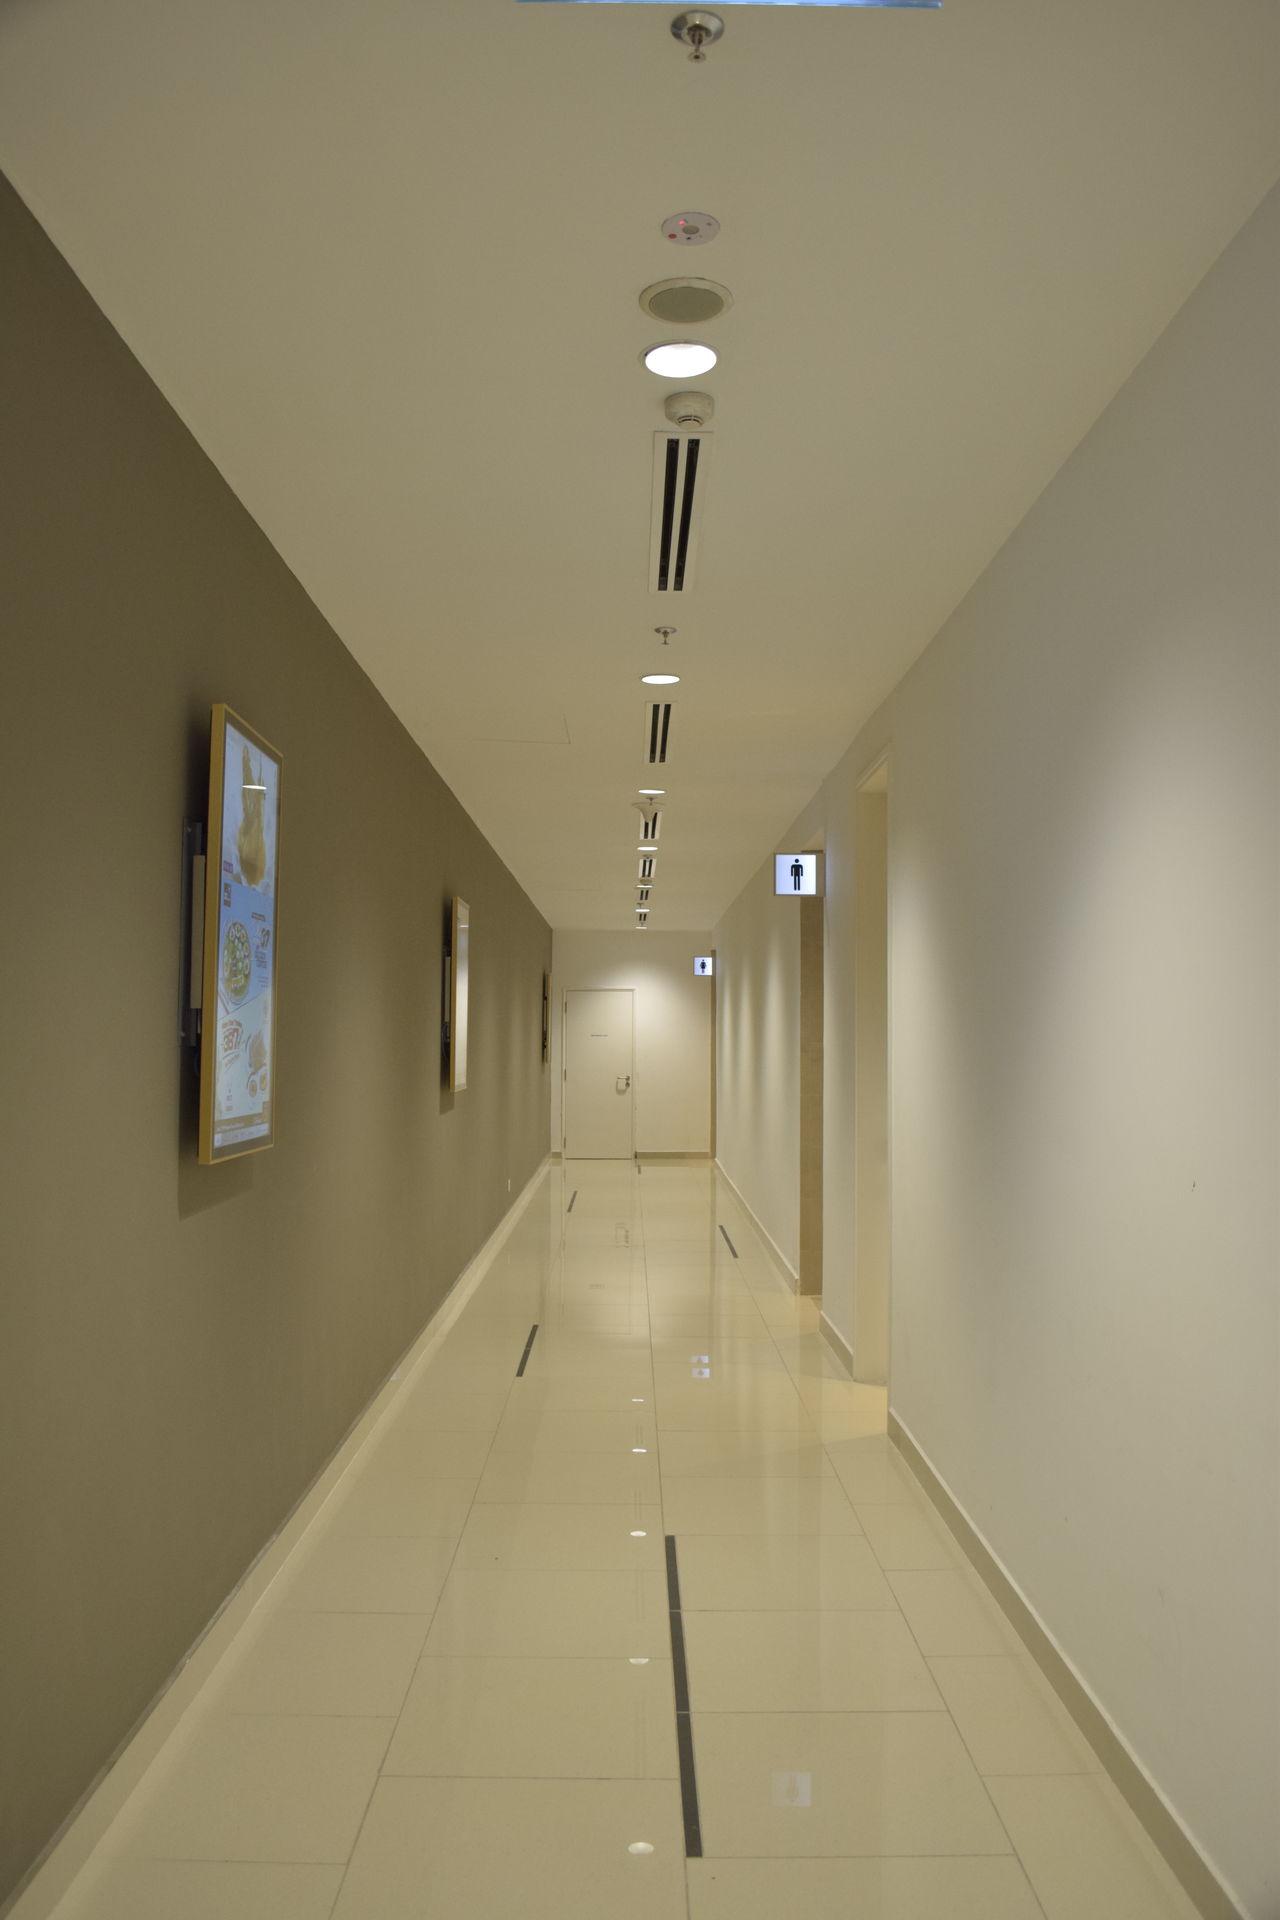 Architecture Day Illuminated Indoors  No People Path Pathwavev Pathway Reflect Light